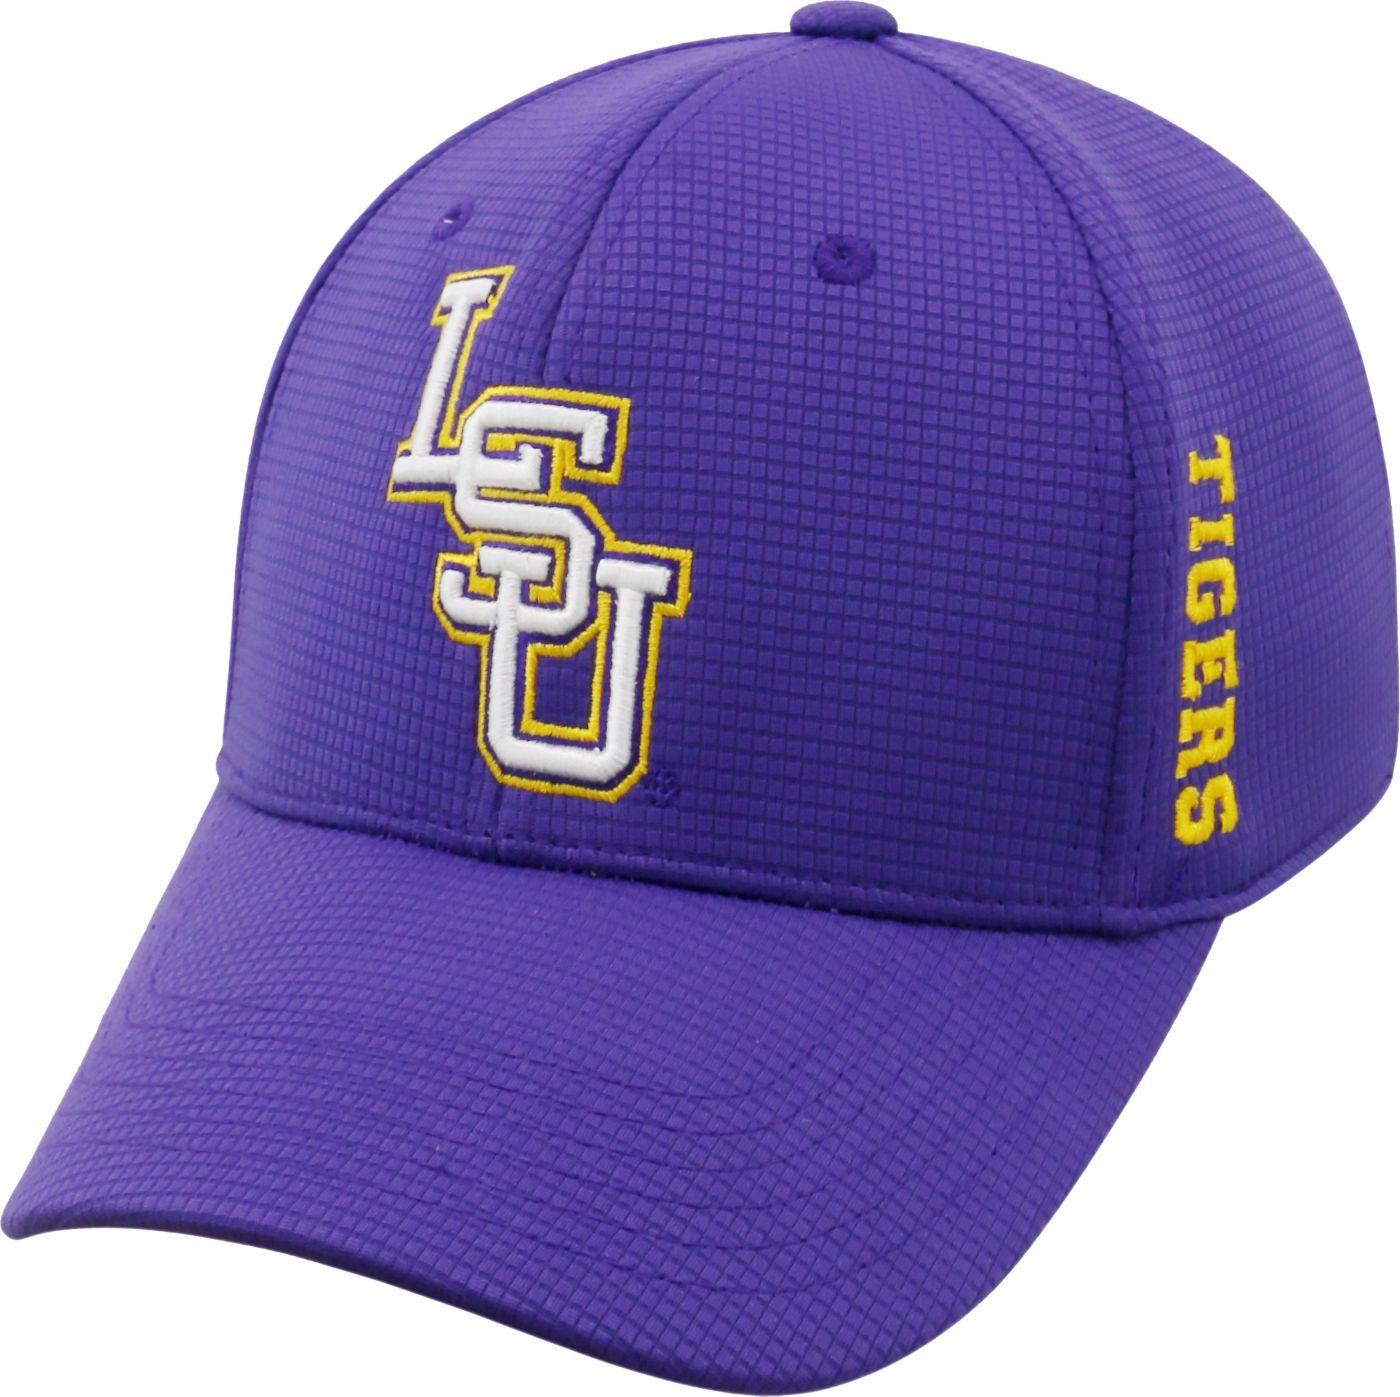 Top of the World Men's LSU Tigers Purple Booster Plus 1Fit Flex Hat